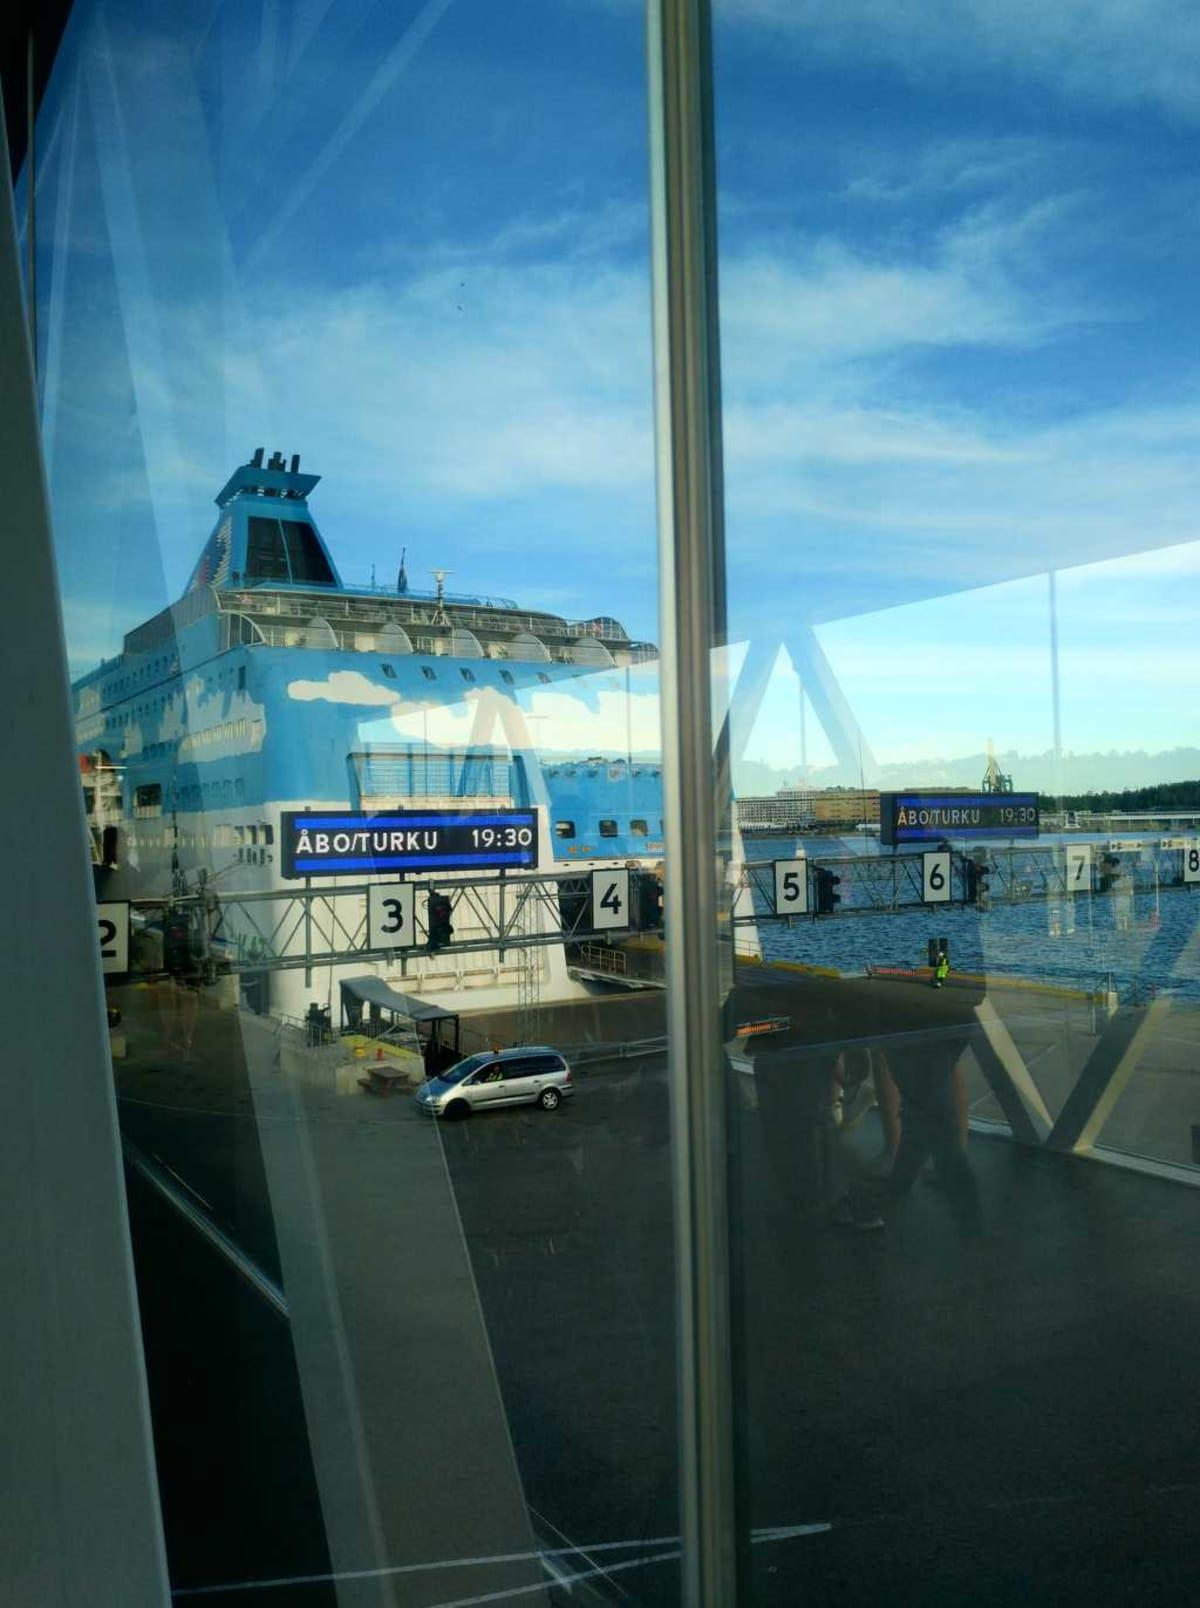 j自動車で乗船する人もおり、それを横目に自分も乗船。